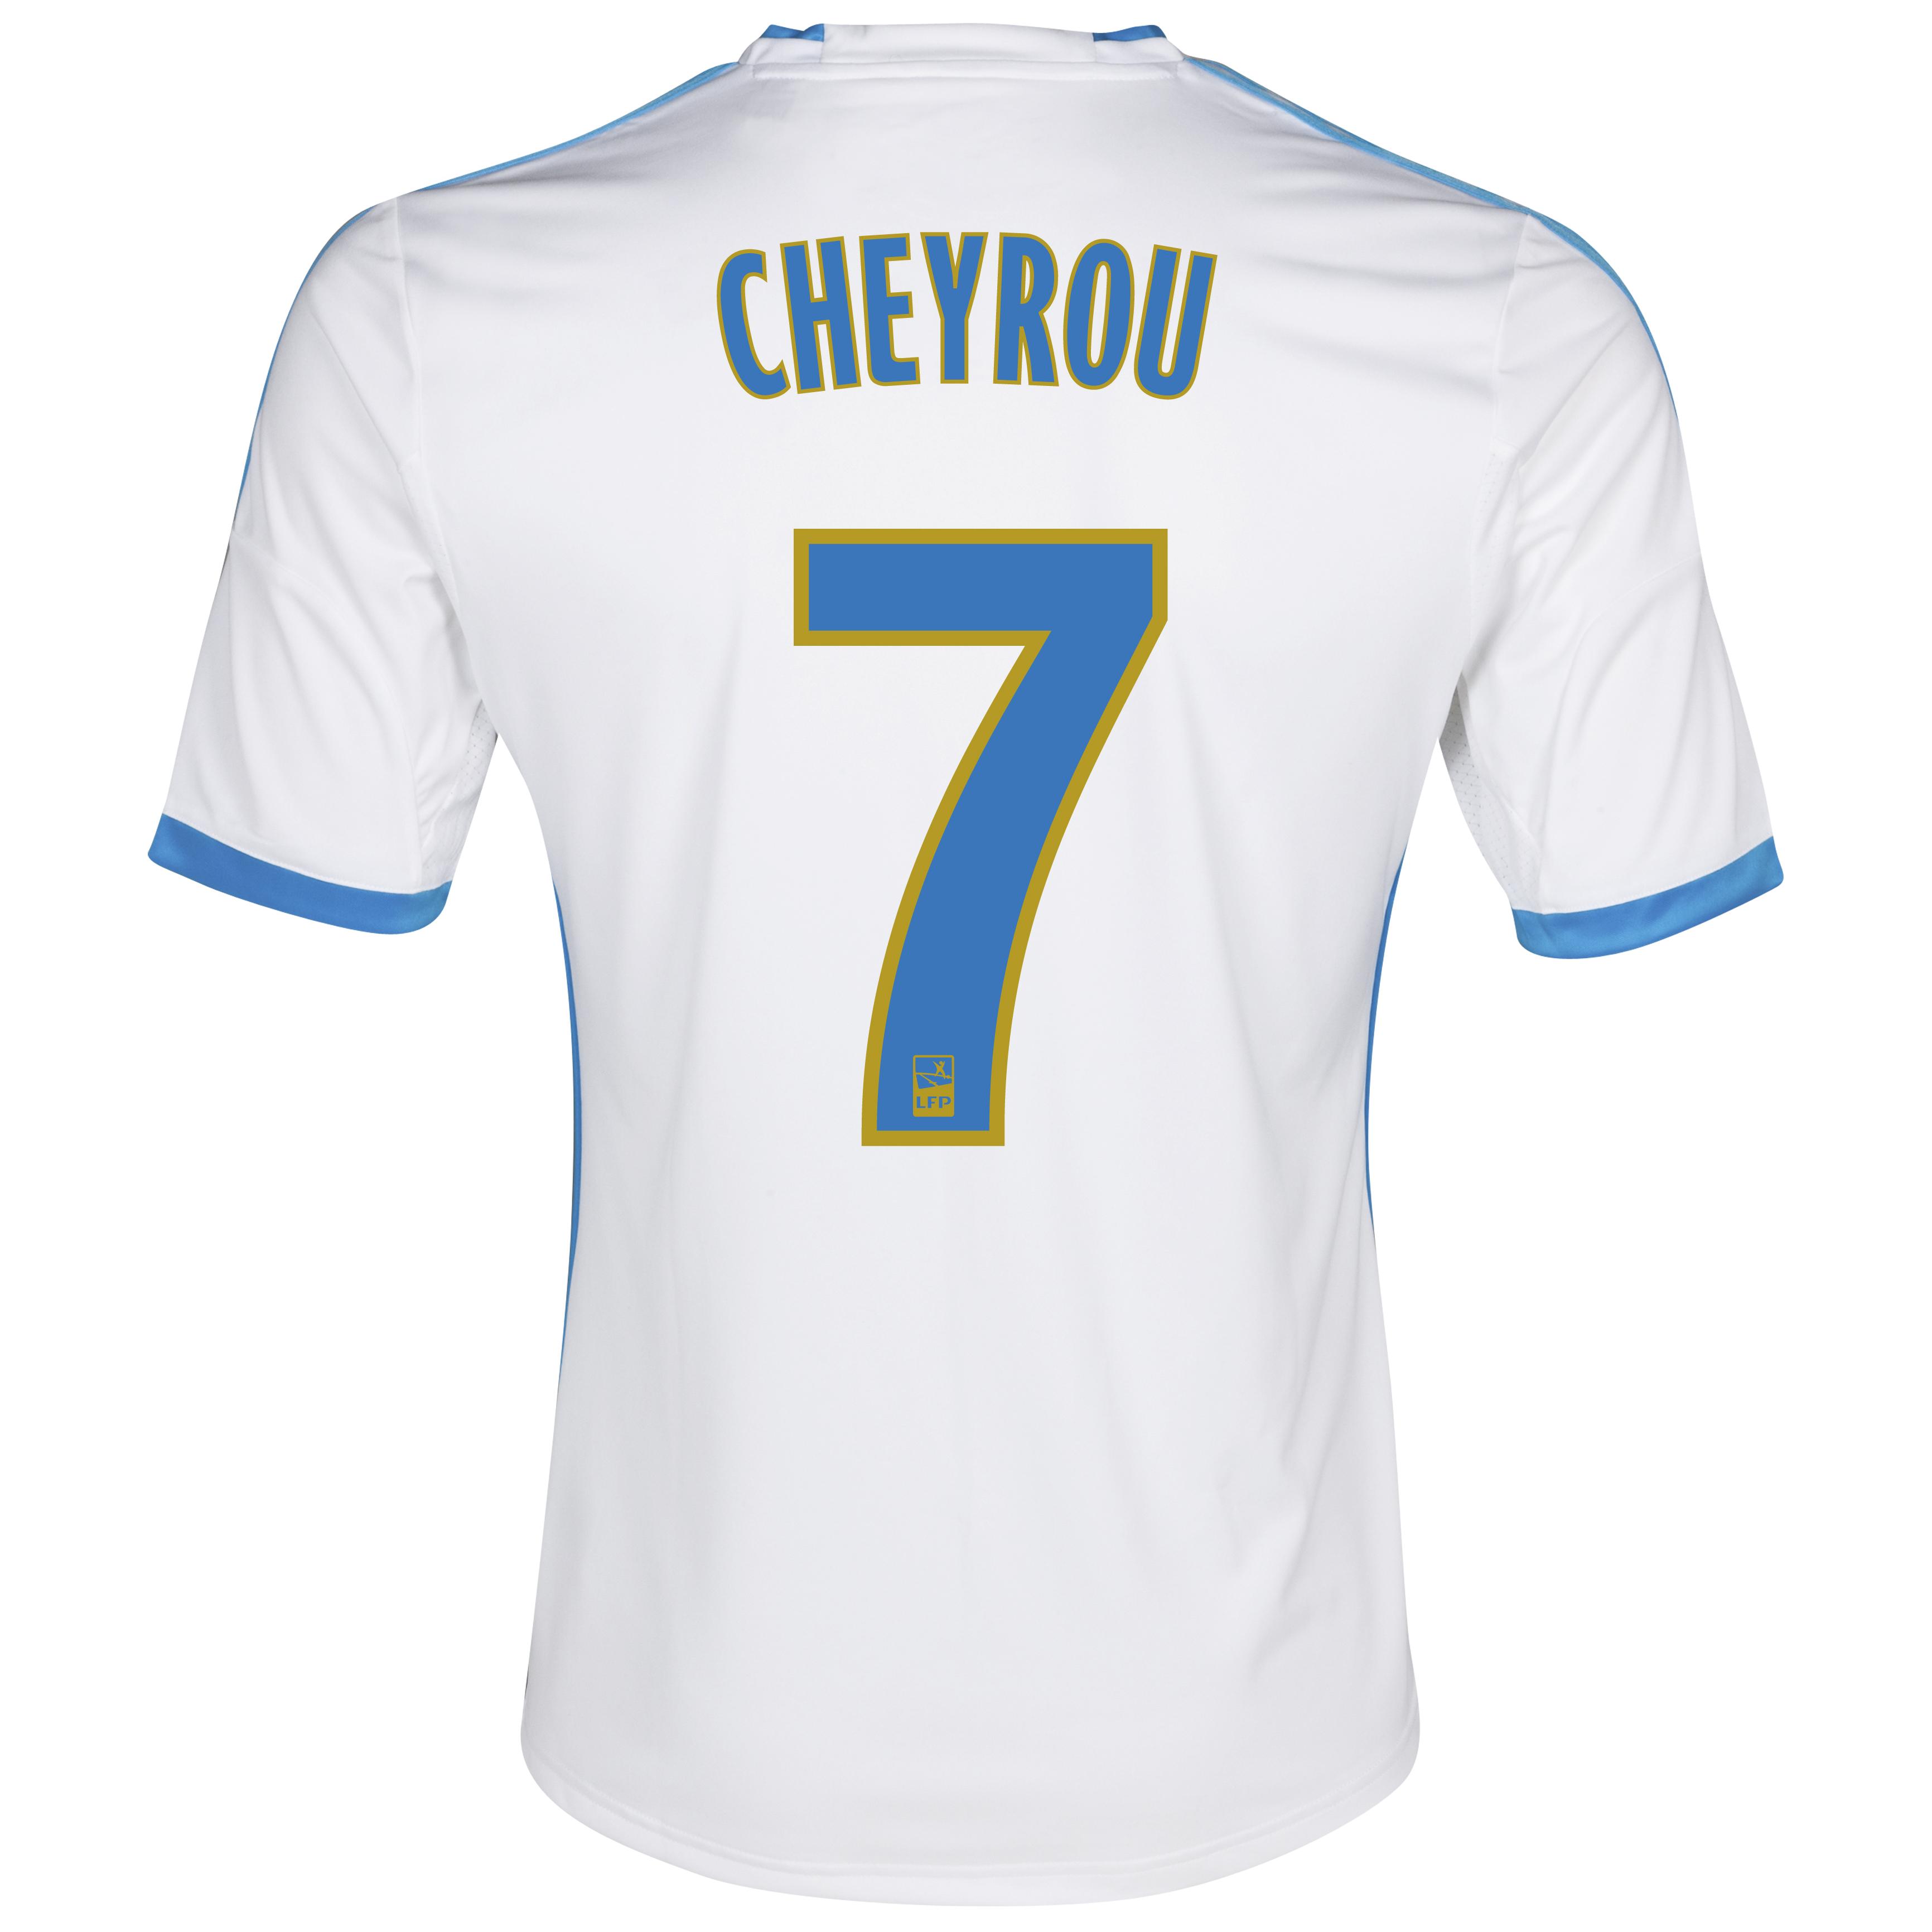 Olympique De Marseille Home Shirt SS 2013/14 - Womens White with Cheyrou 7 printing